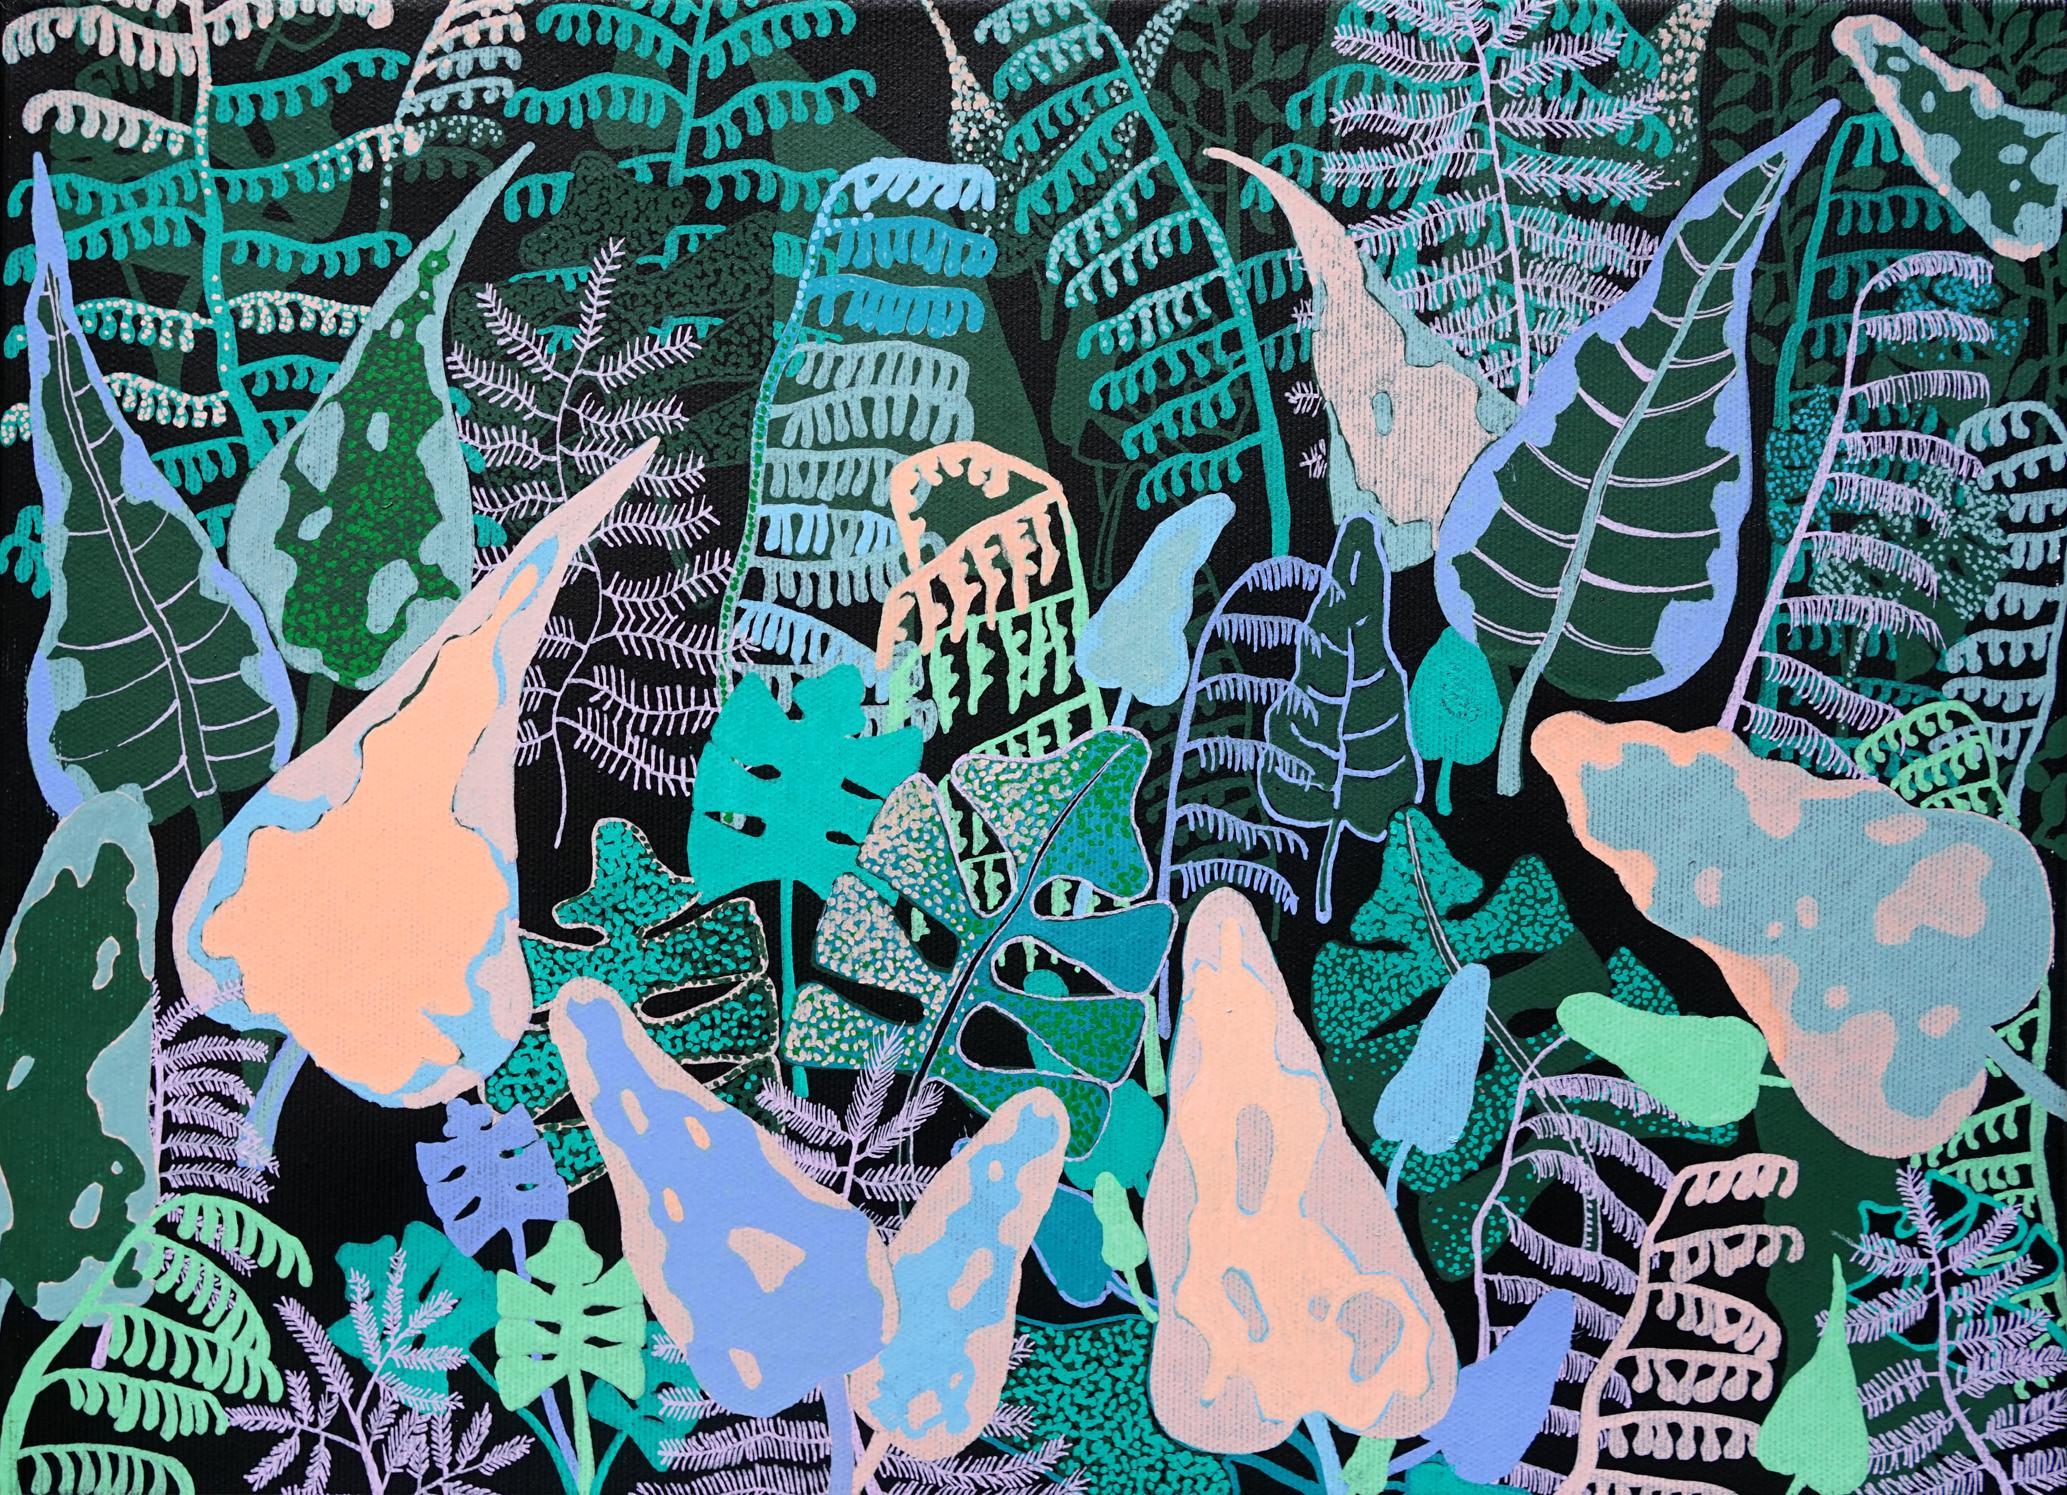 Jungla - Polish Young Art, Contemporary Figurative Painting, Nature, Plants